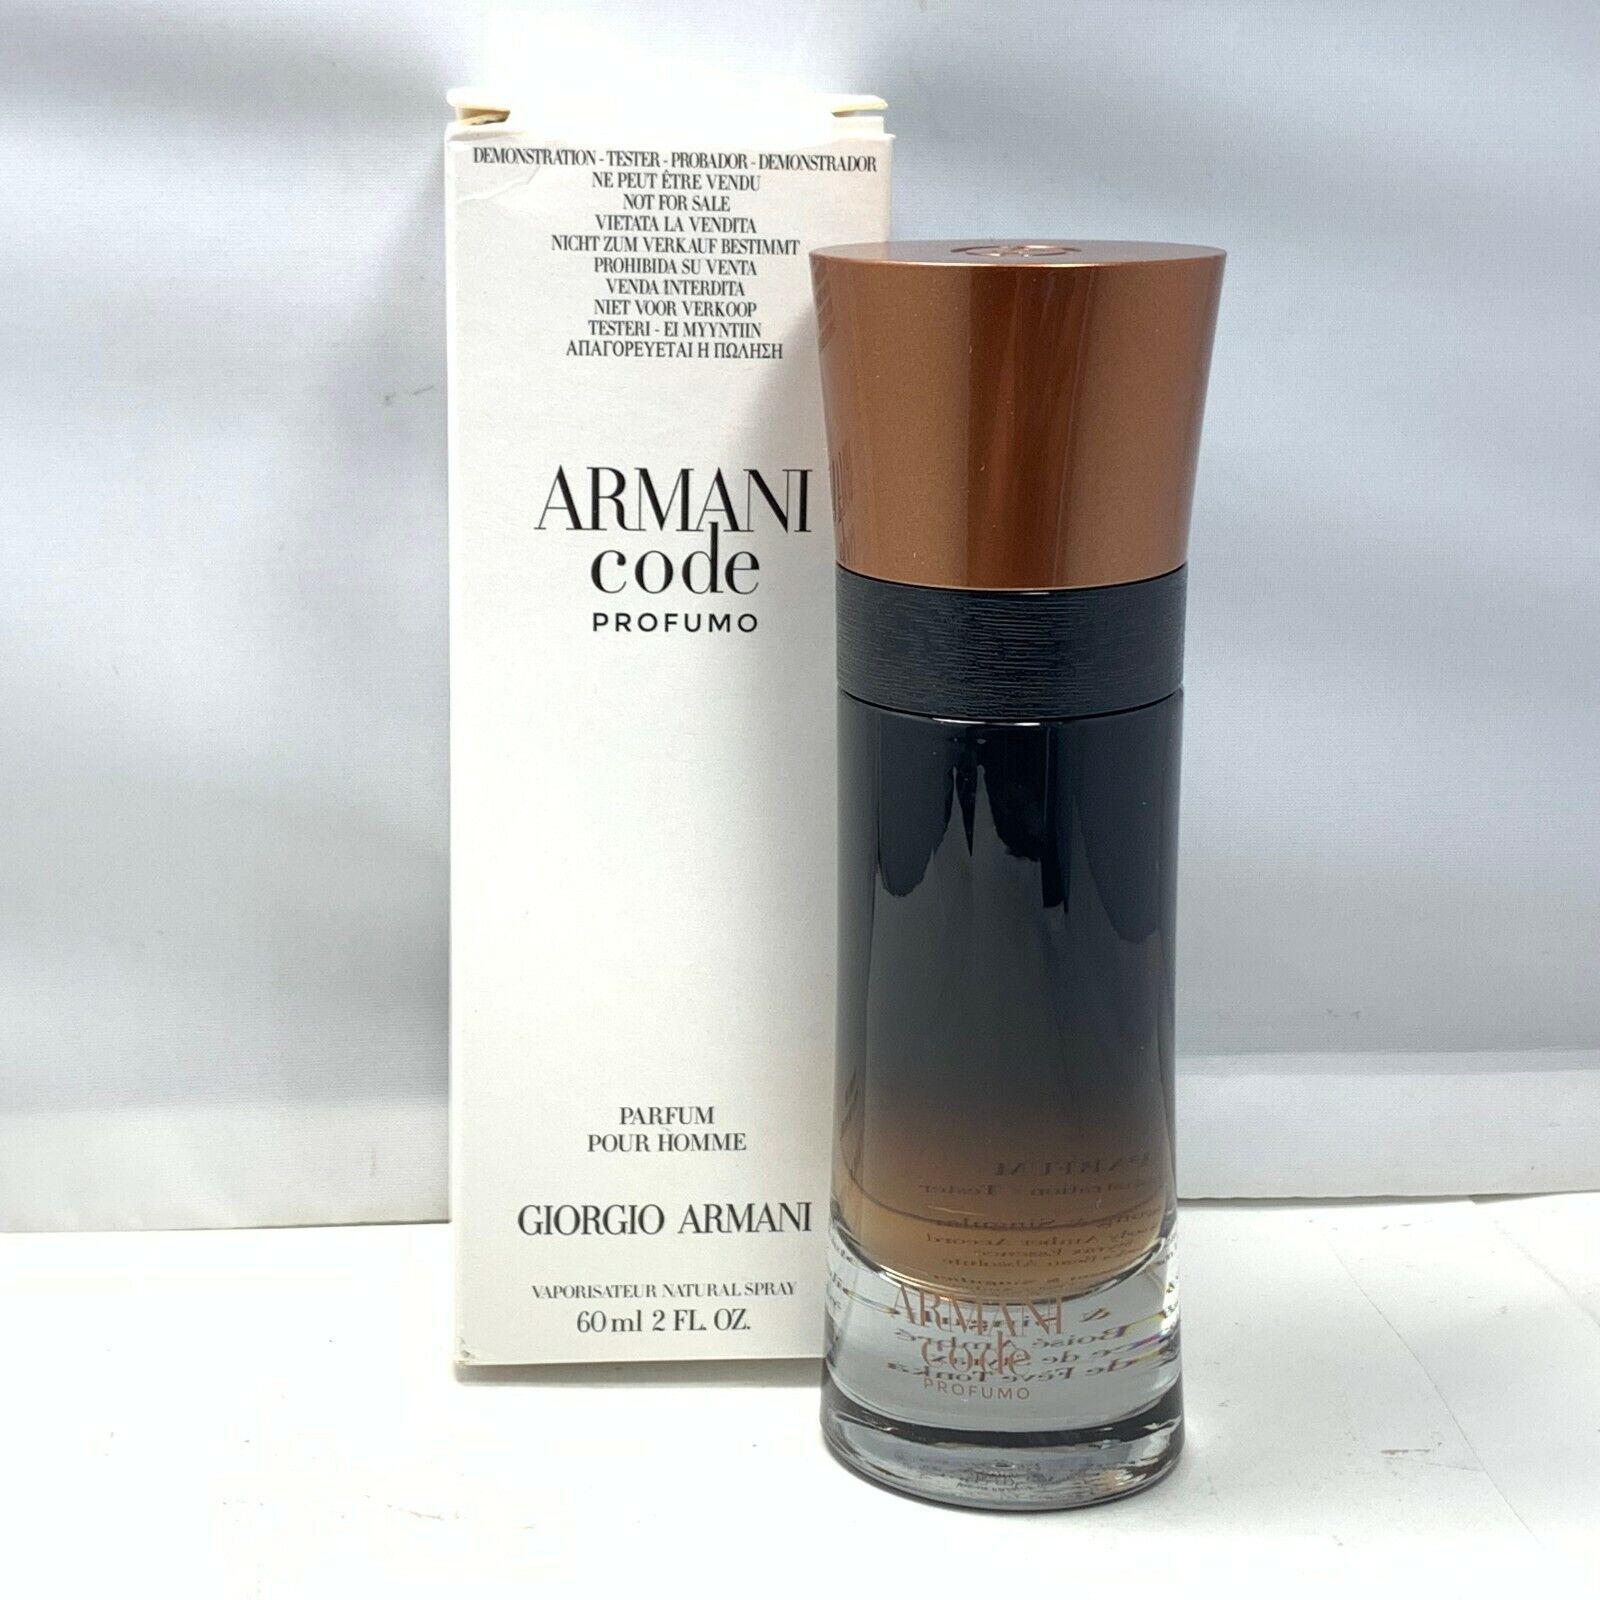 armani code profumo price